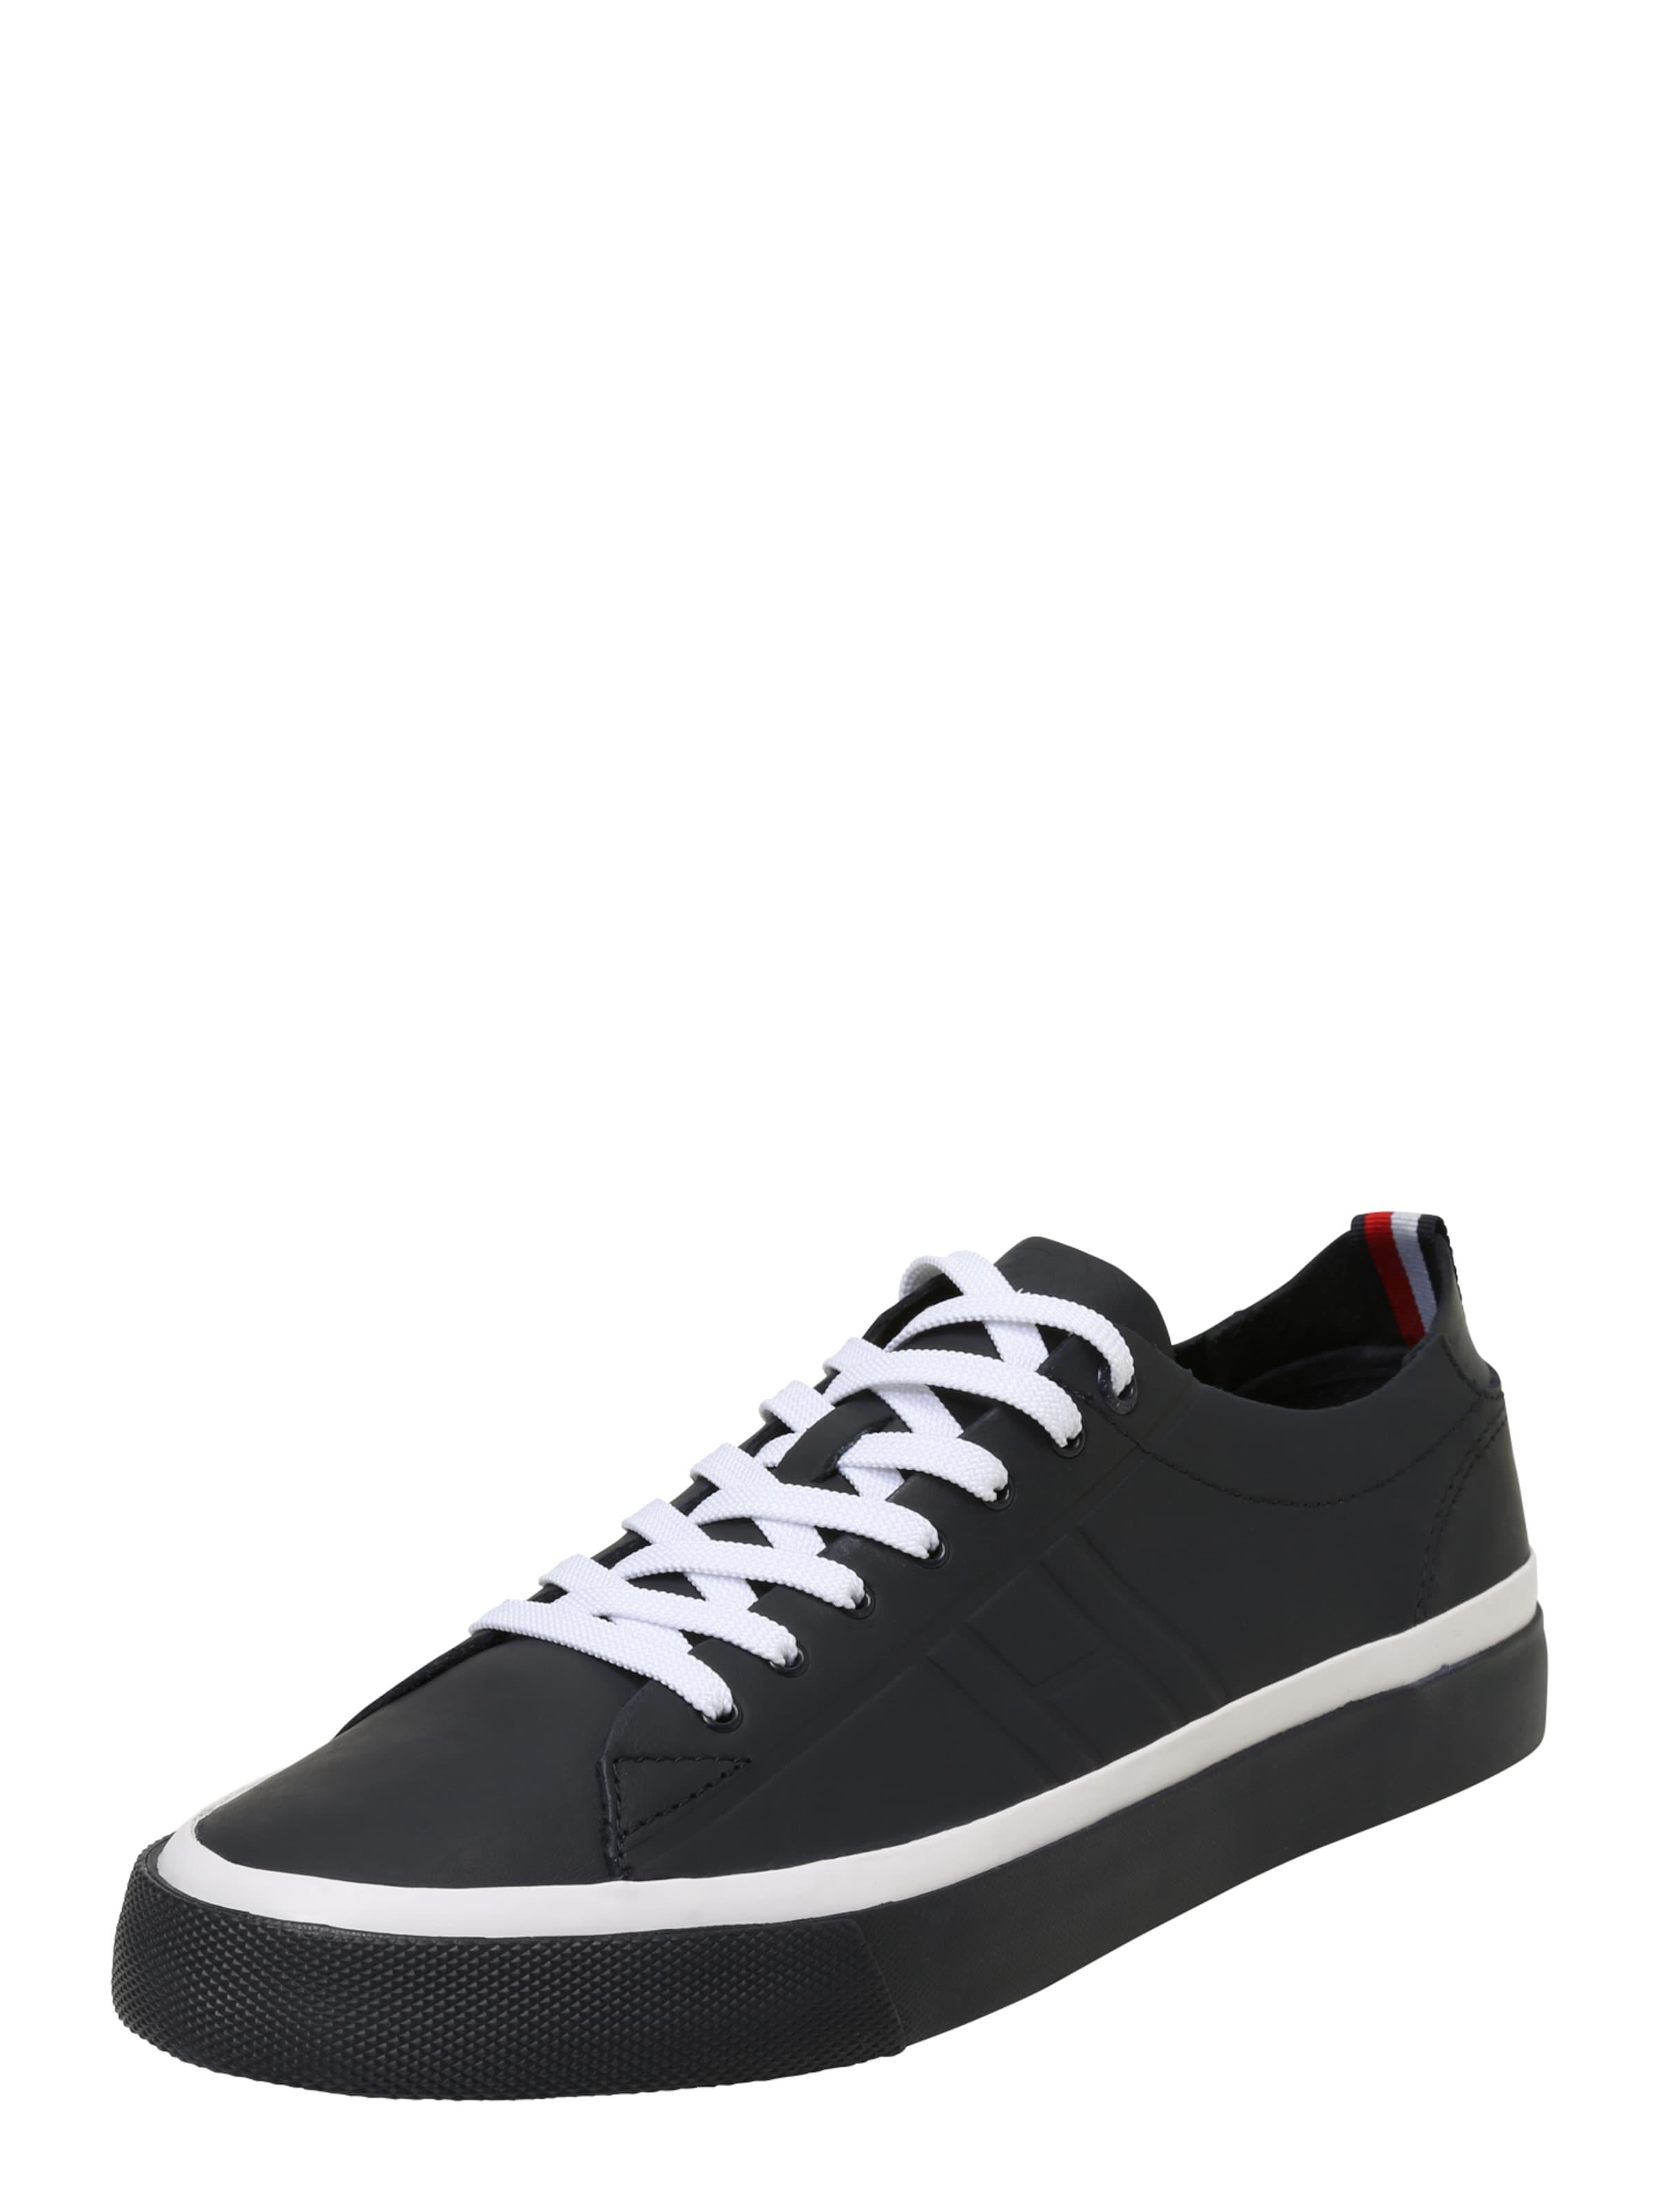 Haltbare Mode billige Schuhe TOMMY HILFIGER   Sneaker Schuhe Gut getragene Schuhe